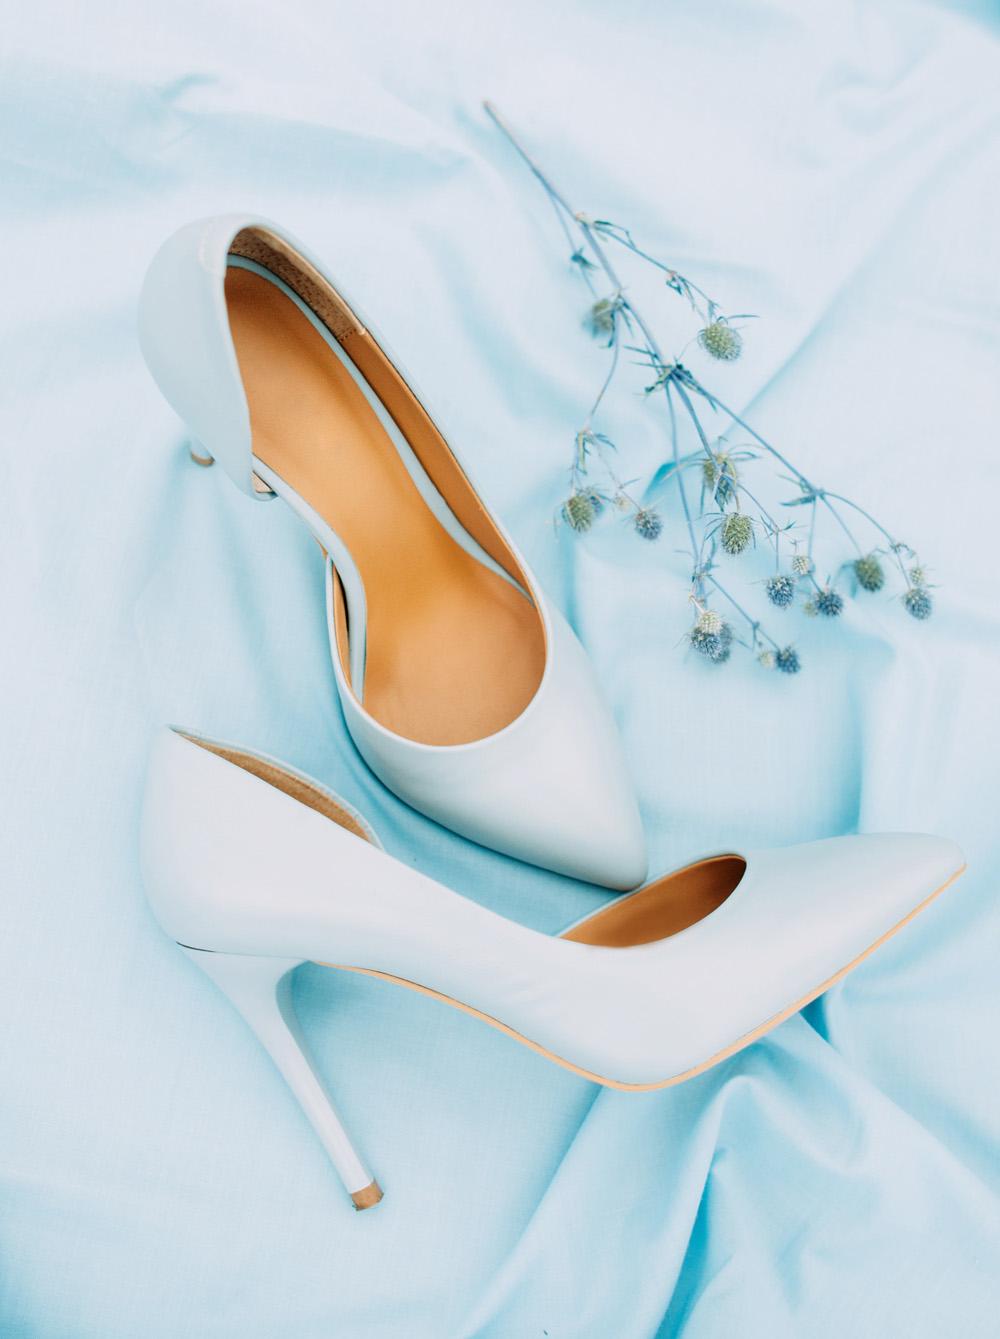 Romantic Blue Lakeside Wedding Inspiration - Light blue wedding shoes